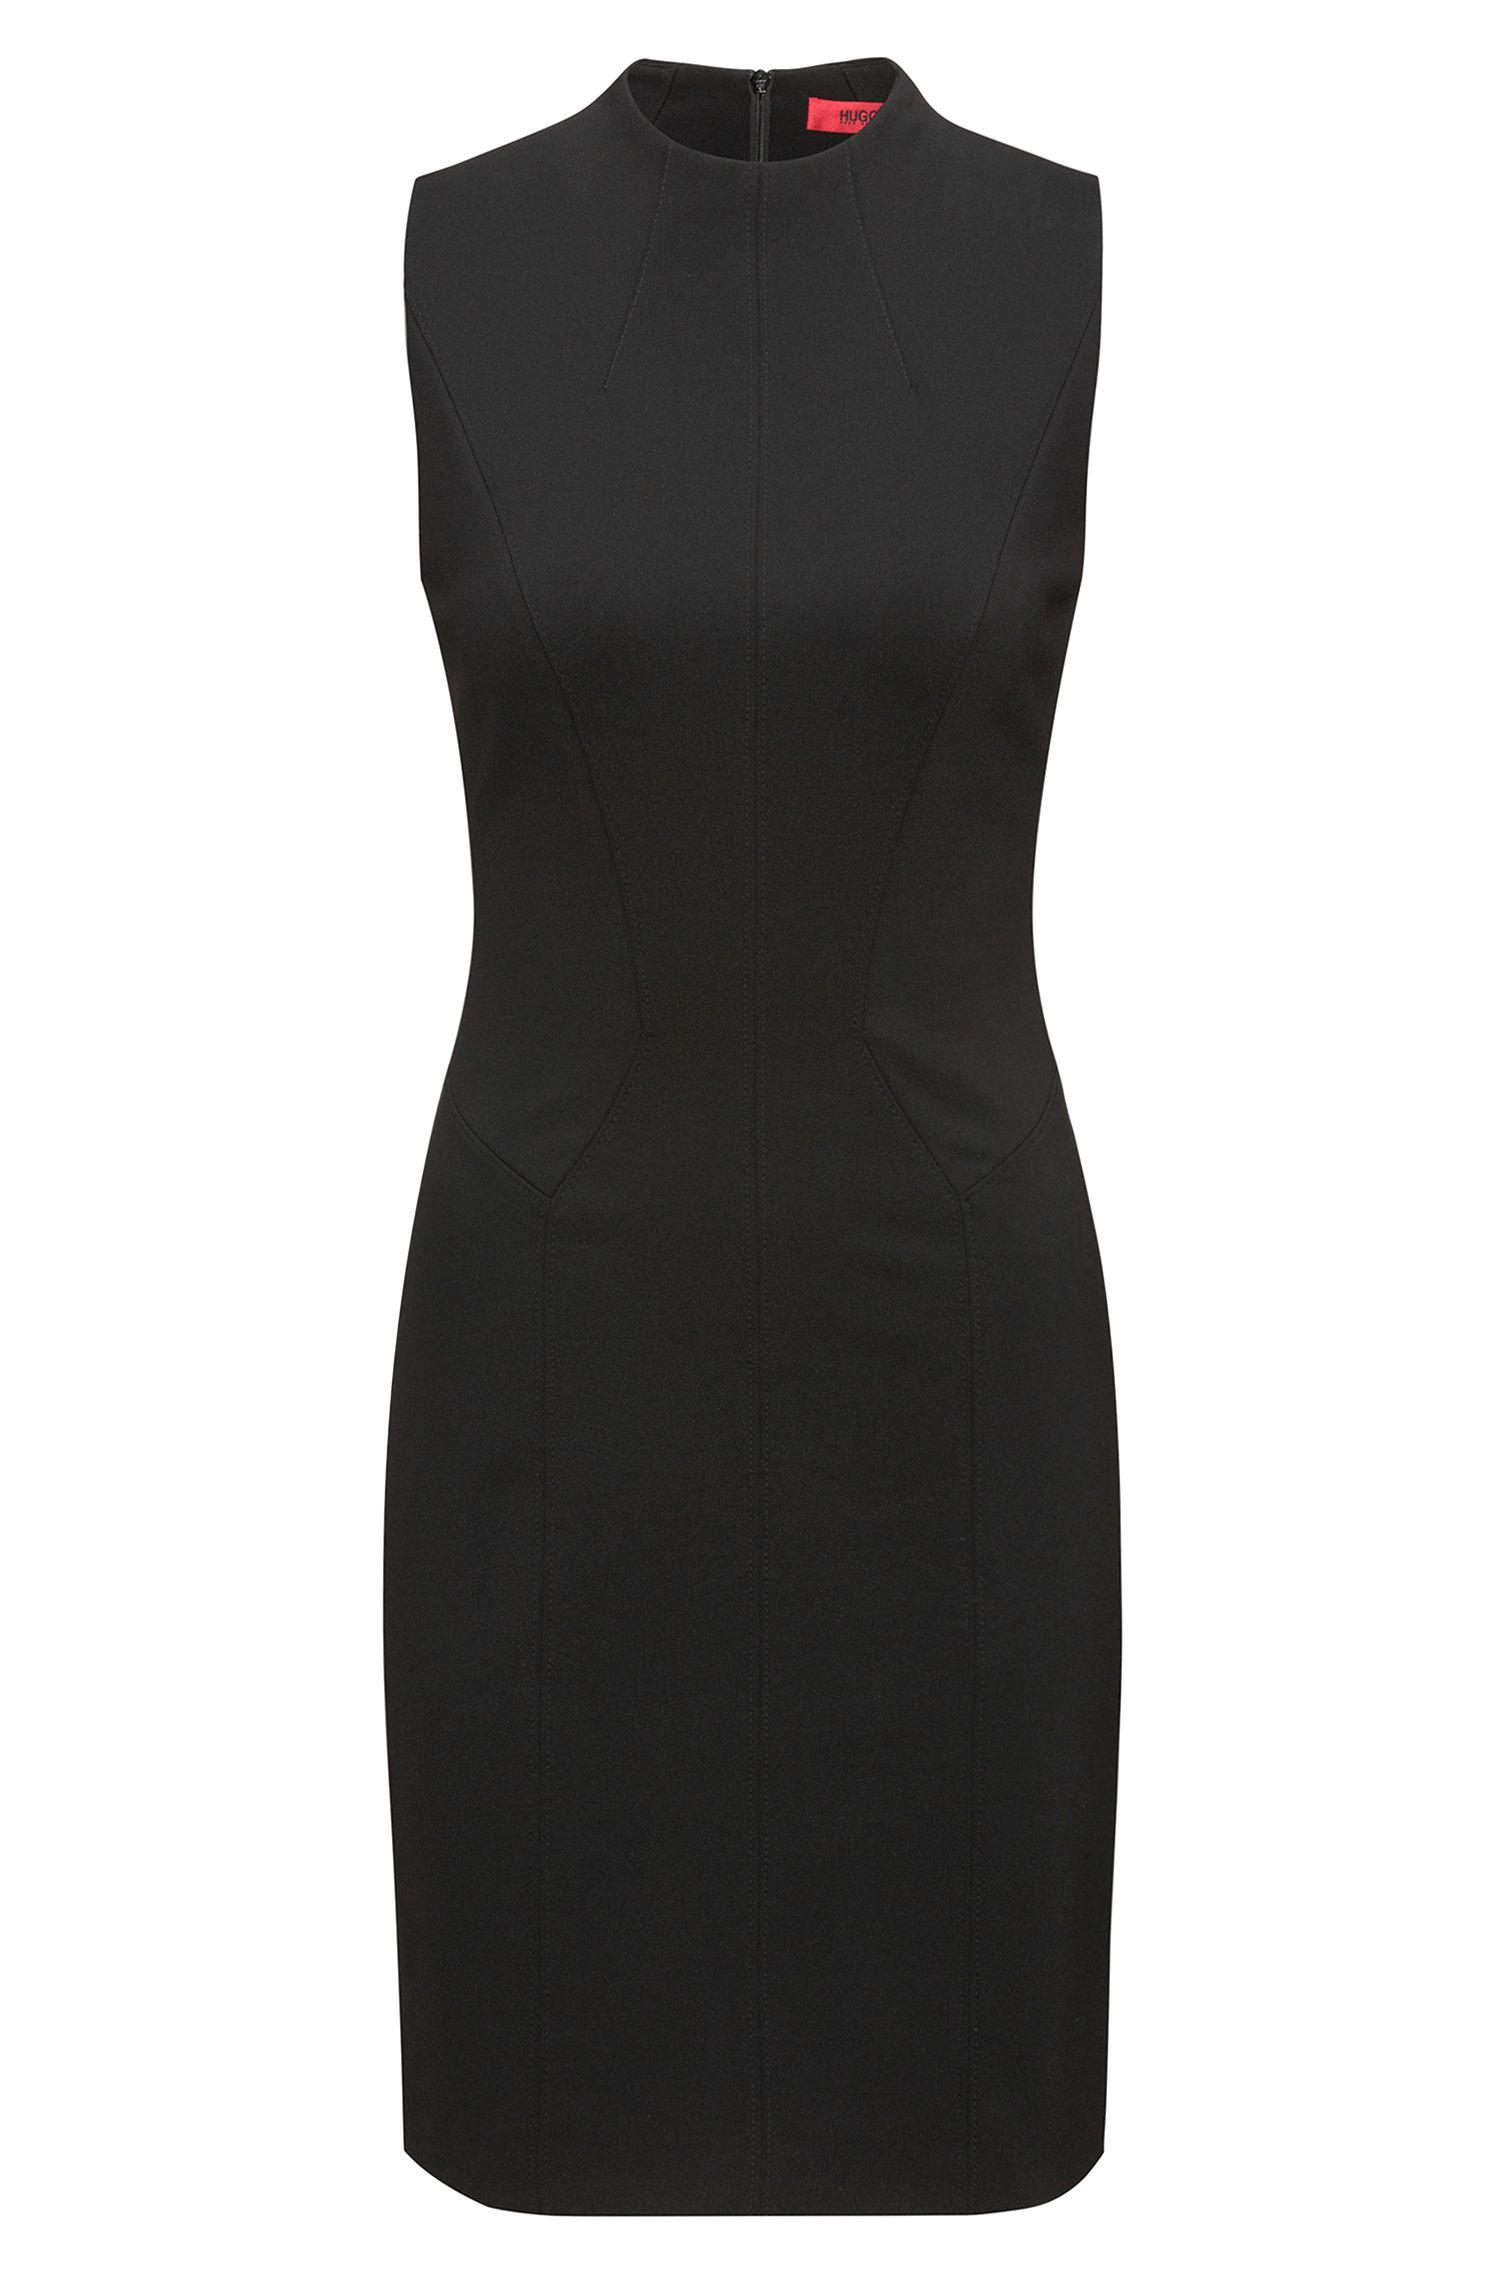 High-Collar Sheath Dress | Kihara, Black